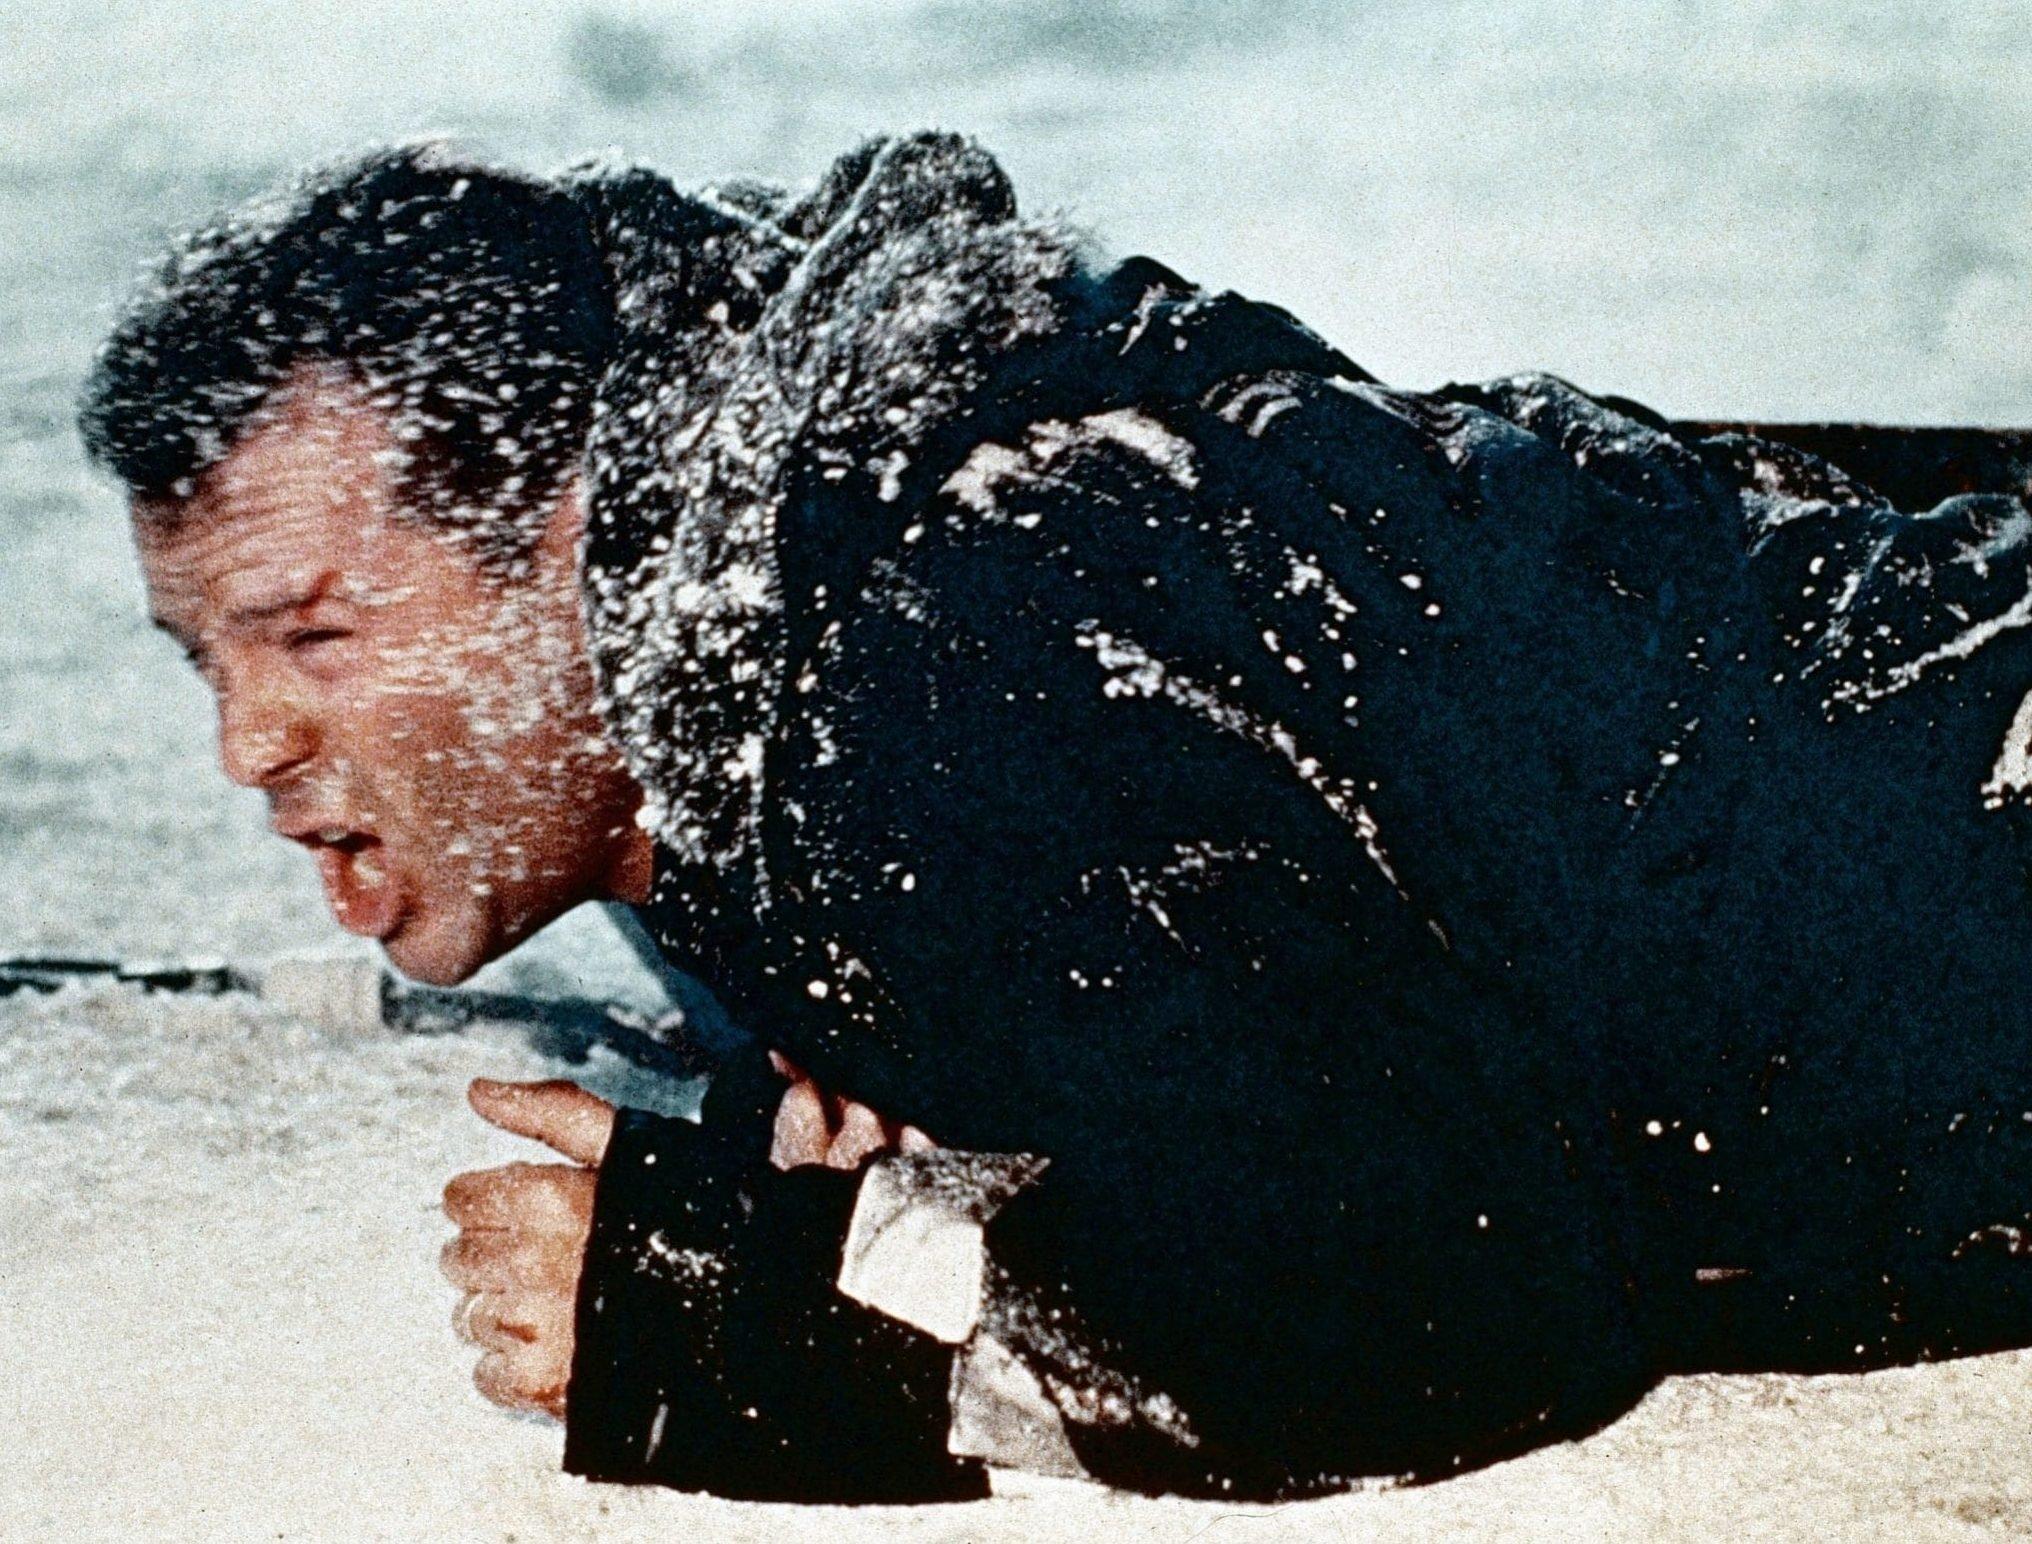 Die Hard 2 Die Harder Bruce Willis e1631023978947 10 Explosive Facts You Never Knew About Die Hard 2: Die Harder